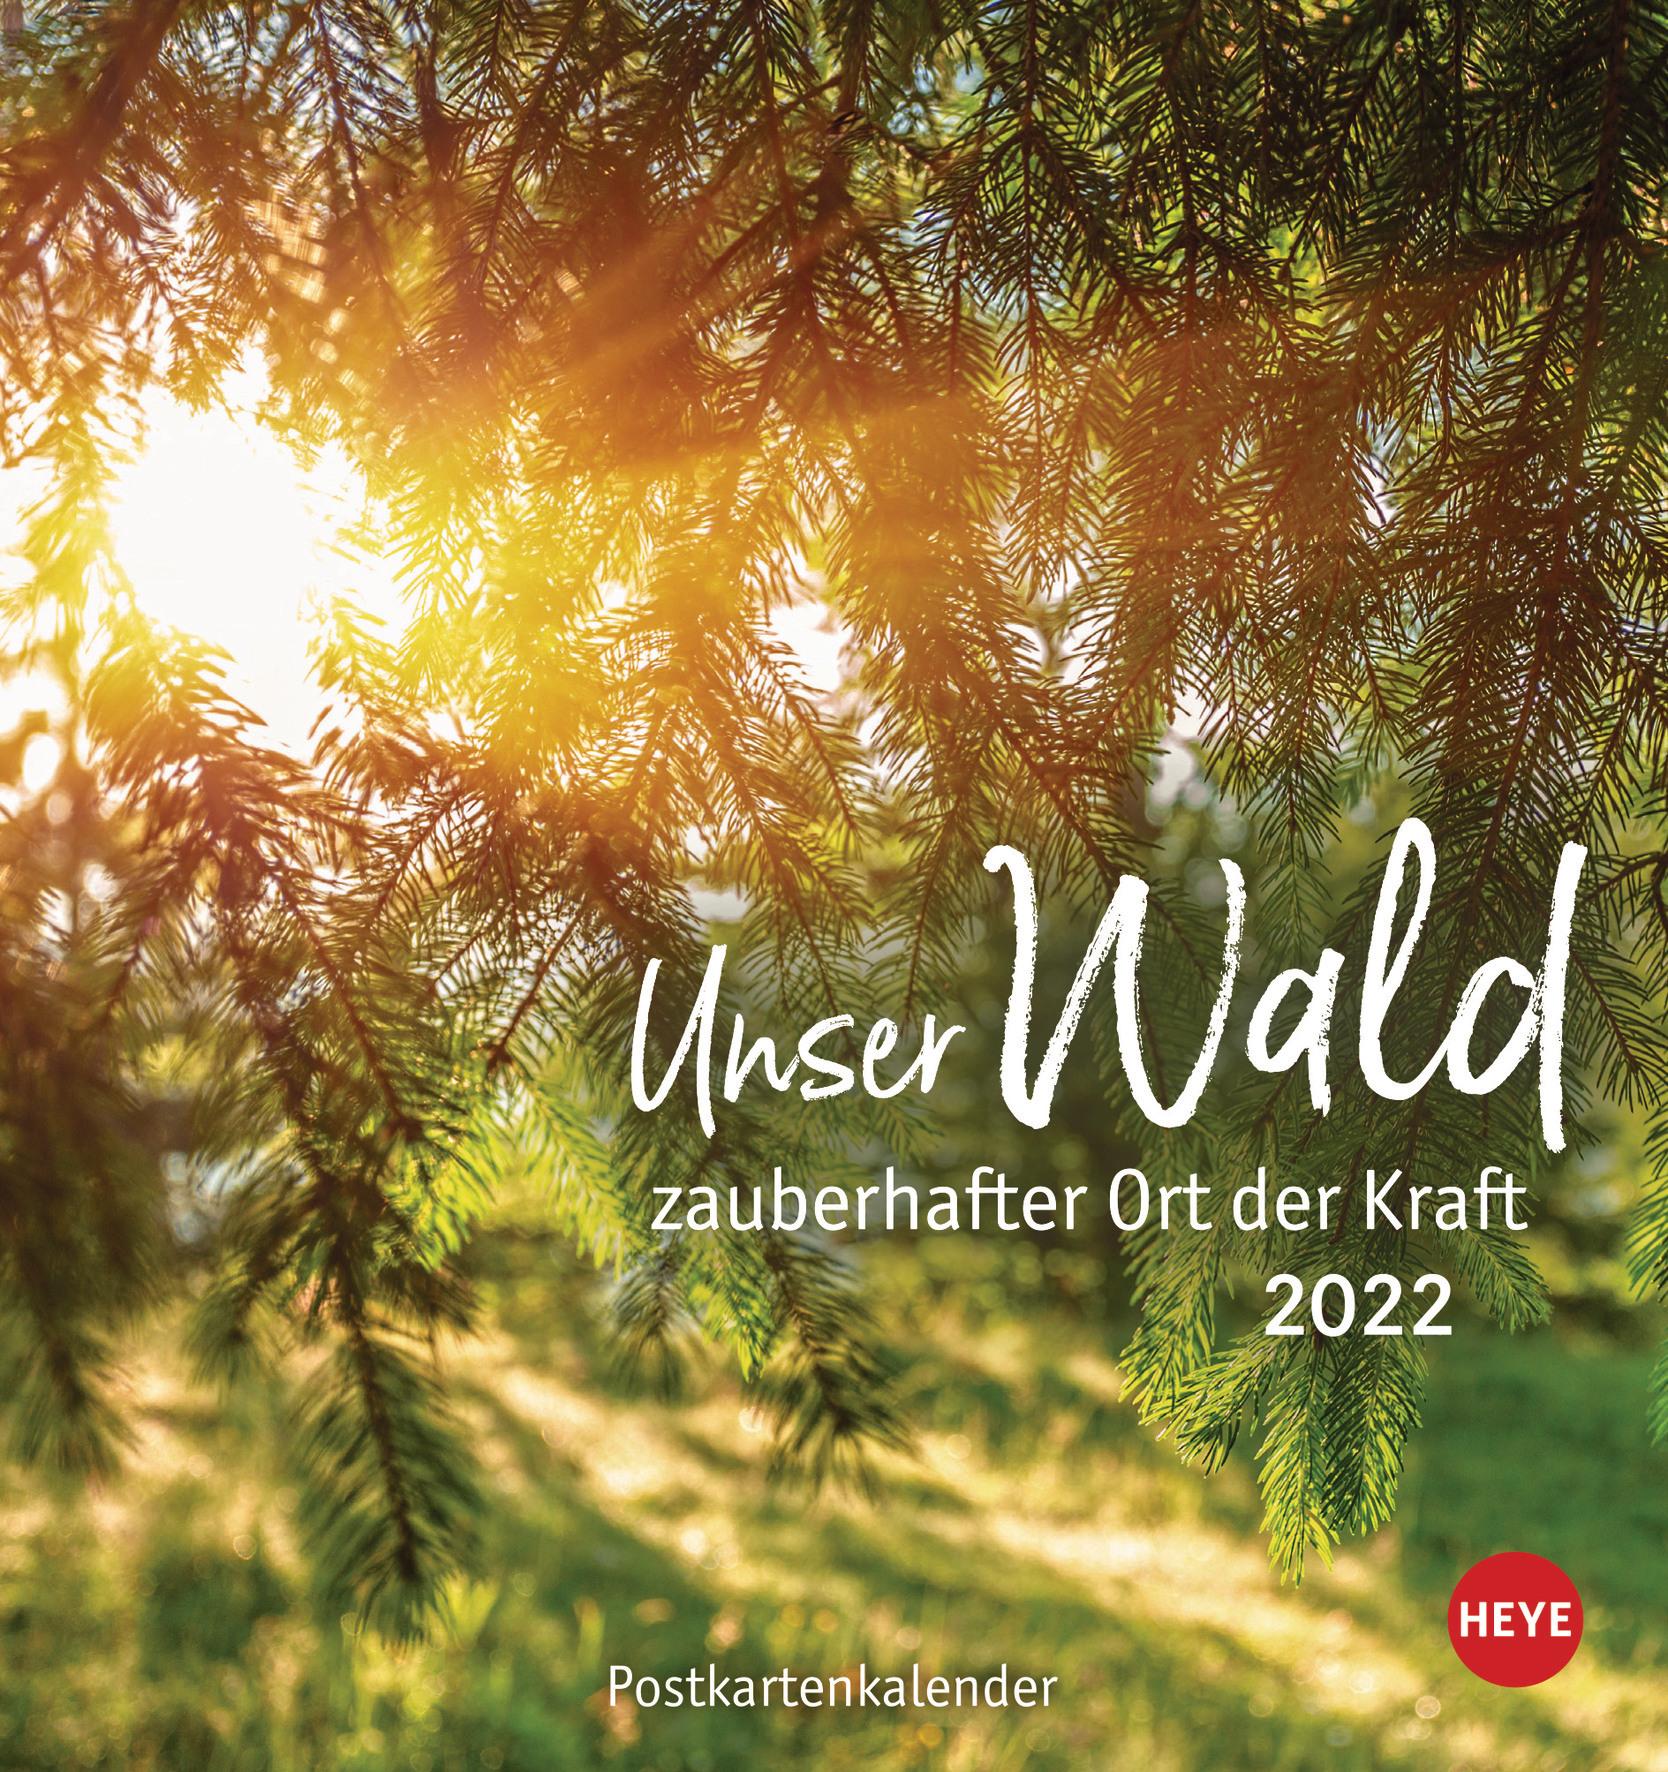 HEYE Unser Wald Postkartenkalender 35449439 D, 16x17cm, 2022